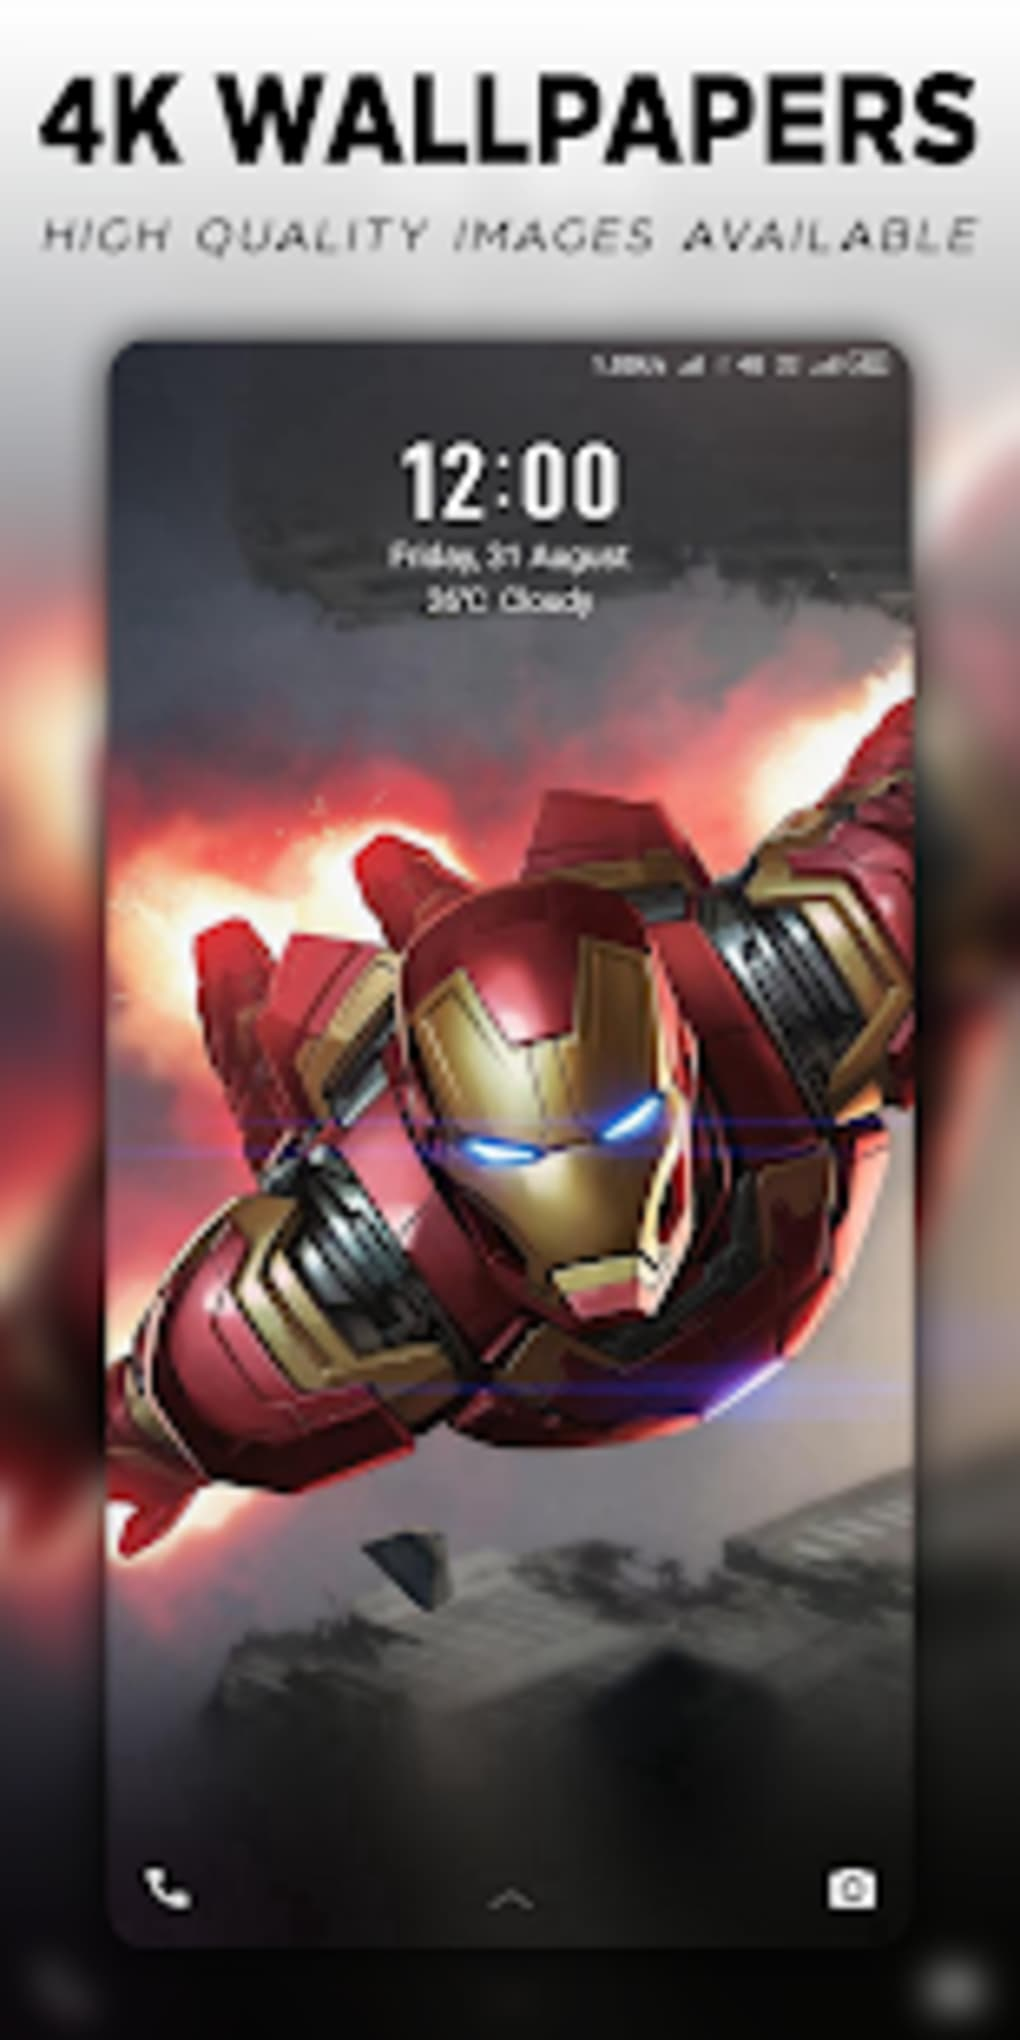 4K Superheroes Wallpapers Live Wallpaper Changer